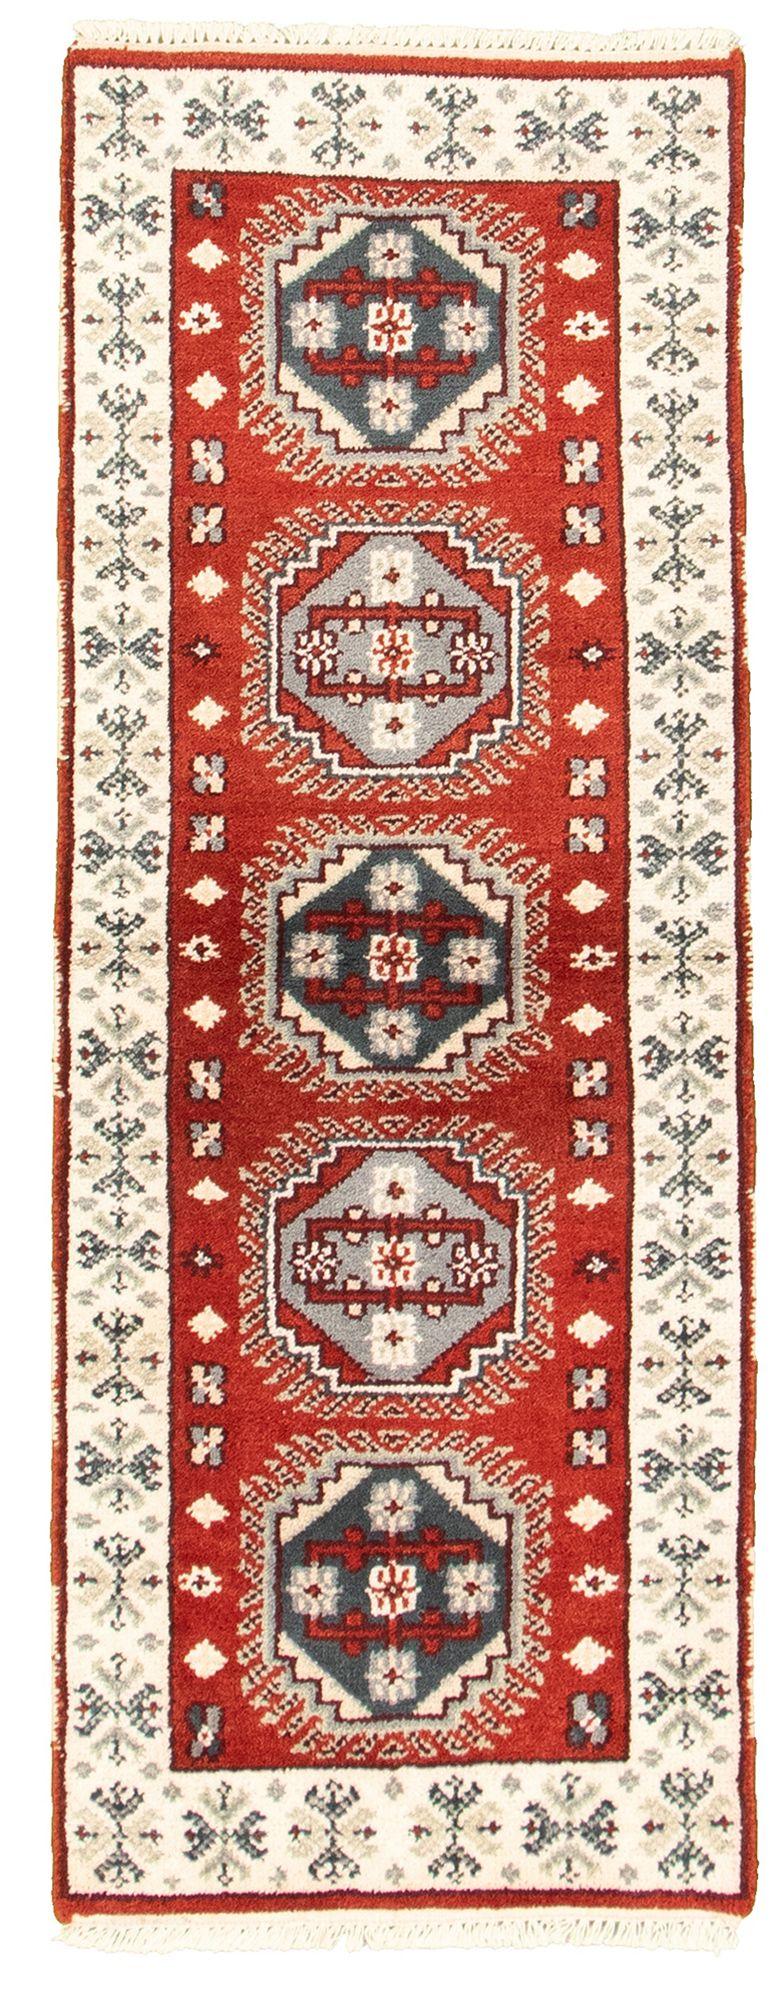 "Hand-knotted Kazak Royal IV Dark Copper Wool Rug 2'4"" x 6'0"" Size: 2'4"" x 6'0"""